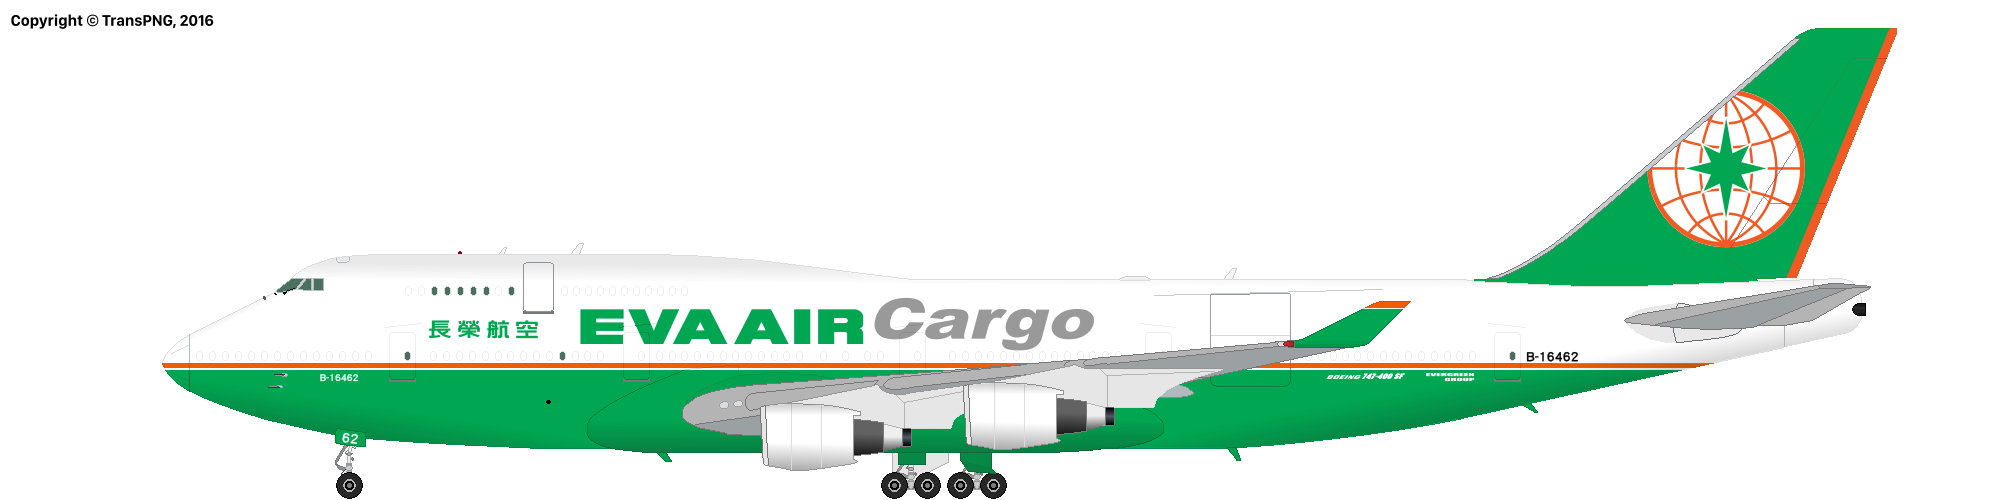 Airplane 6205